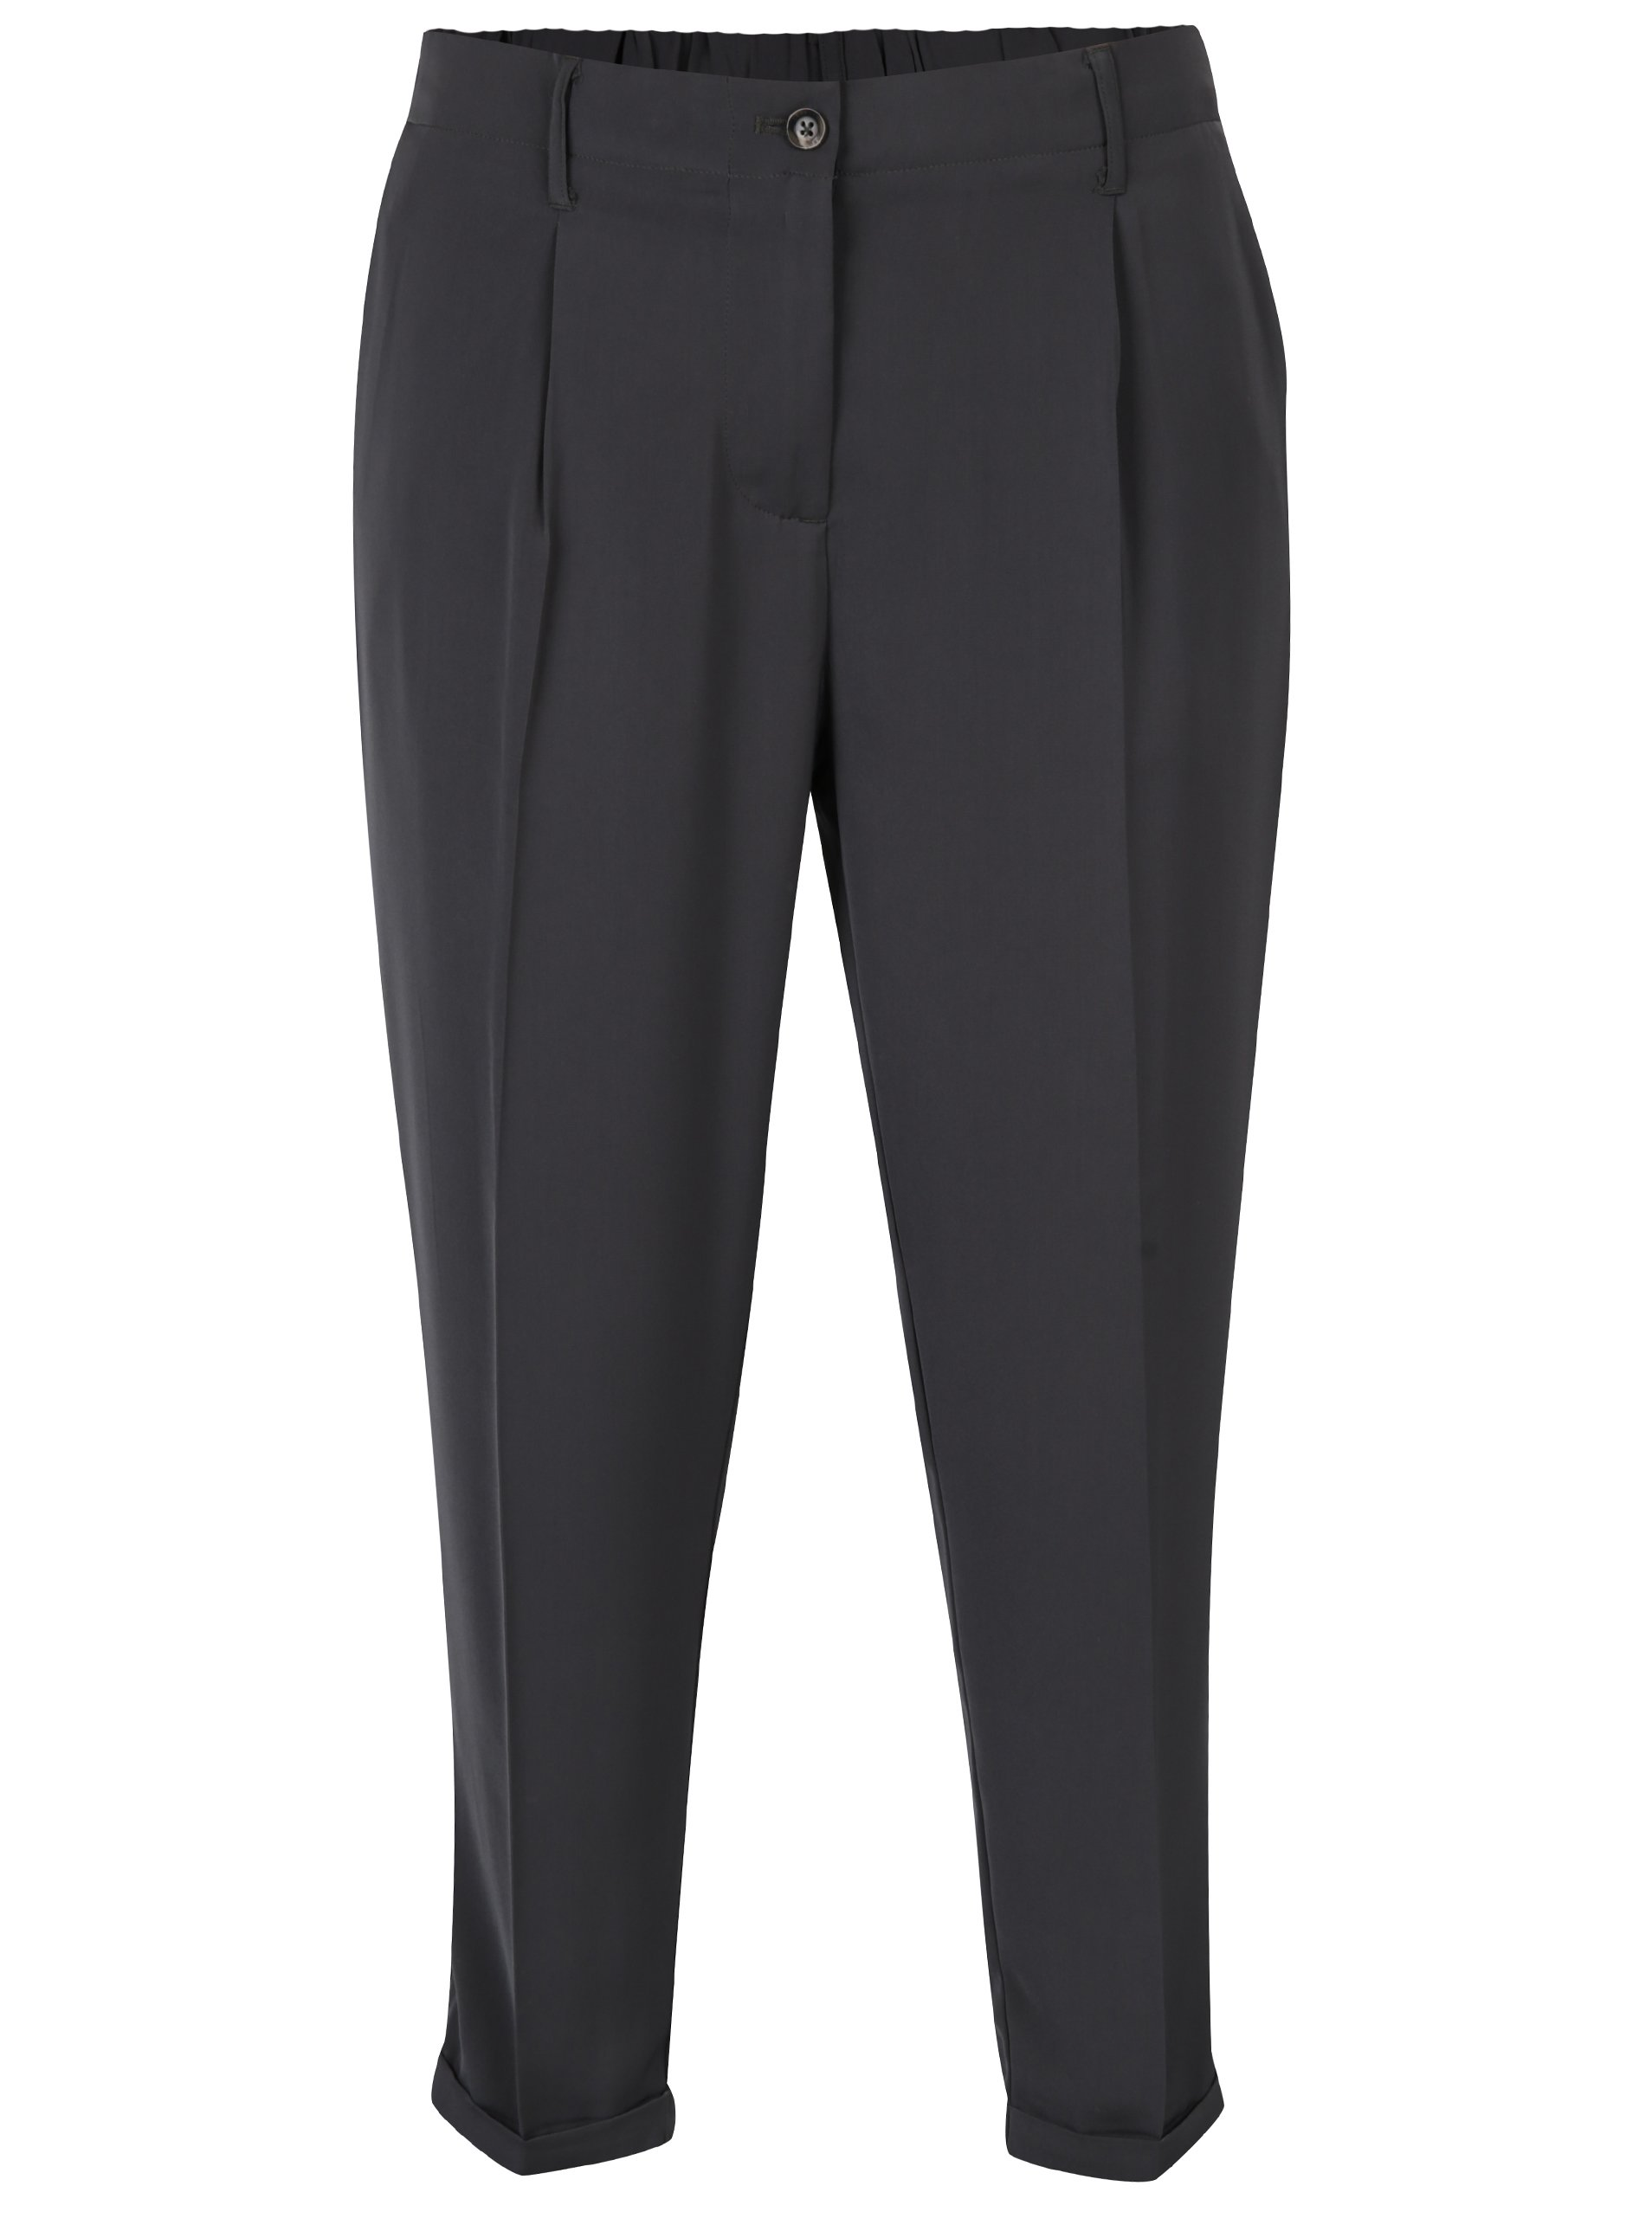 Tmavosivé dámske voľné skrátené nohavice s vysokým pásom Broadway Lilou 0dbb65f541c